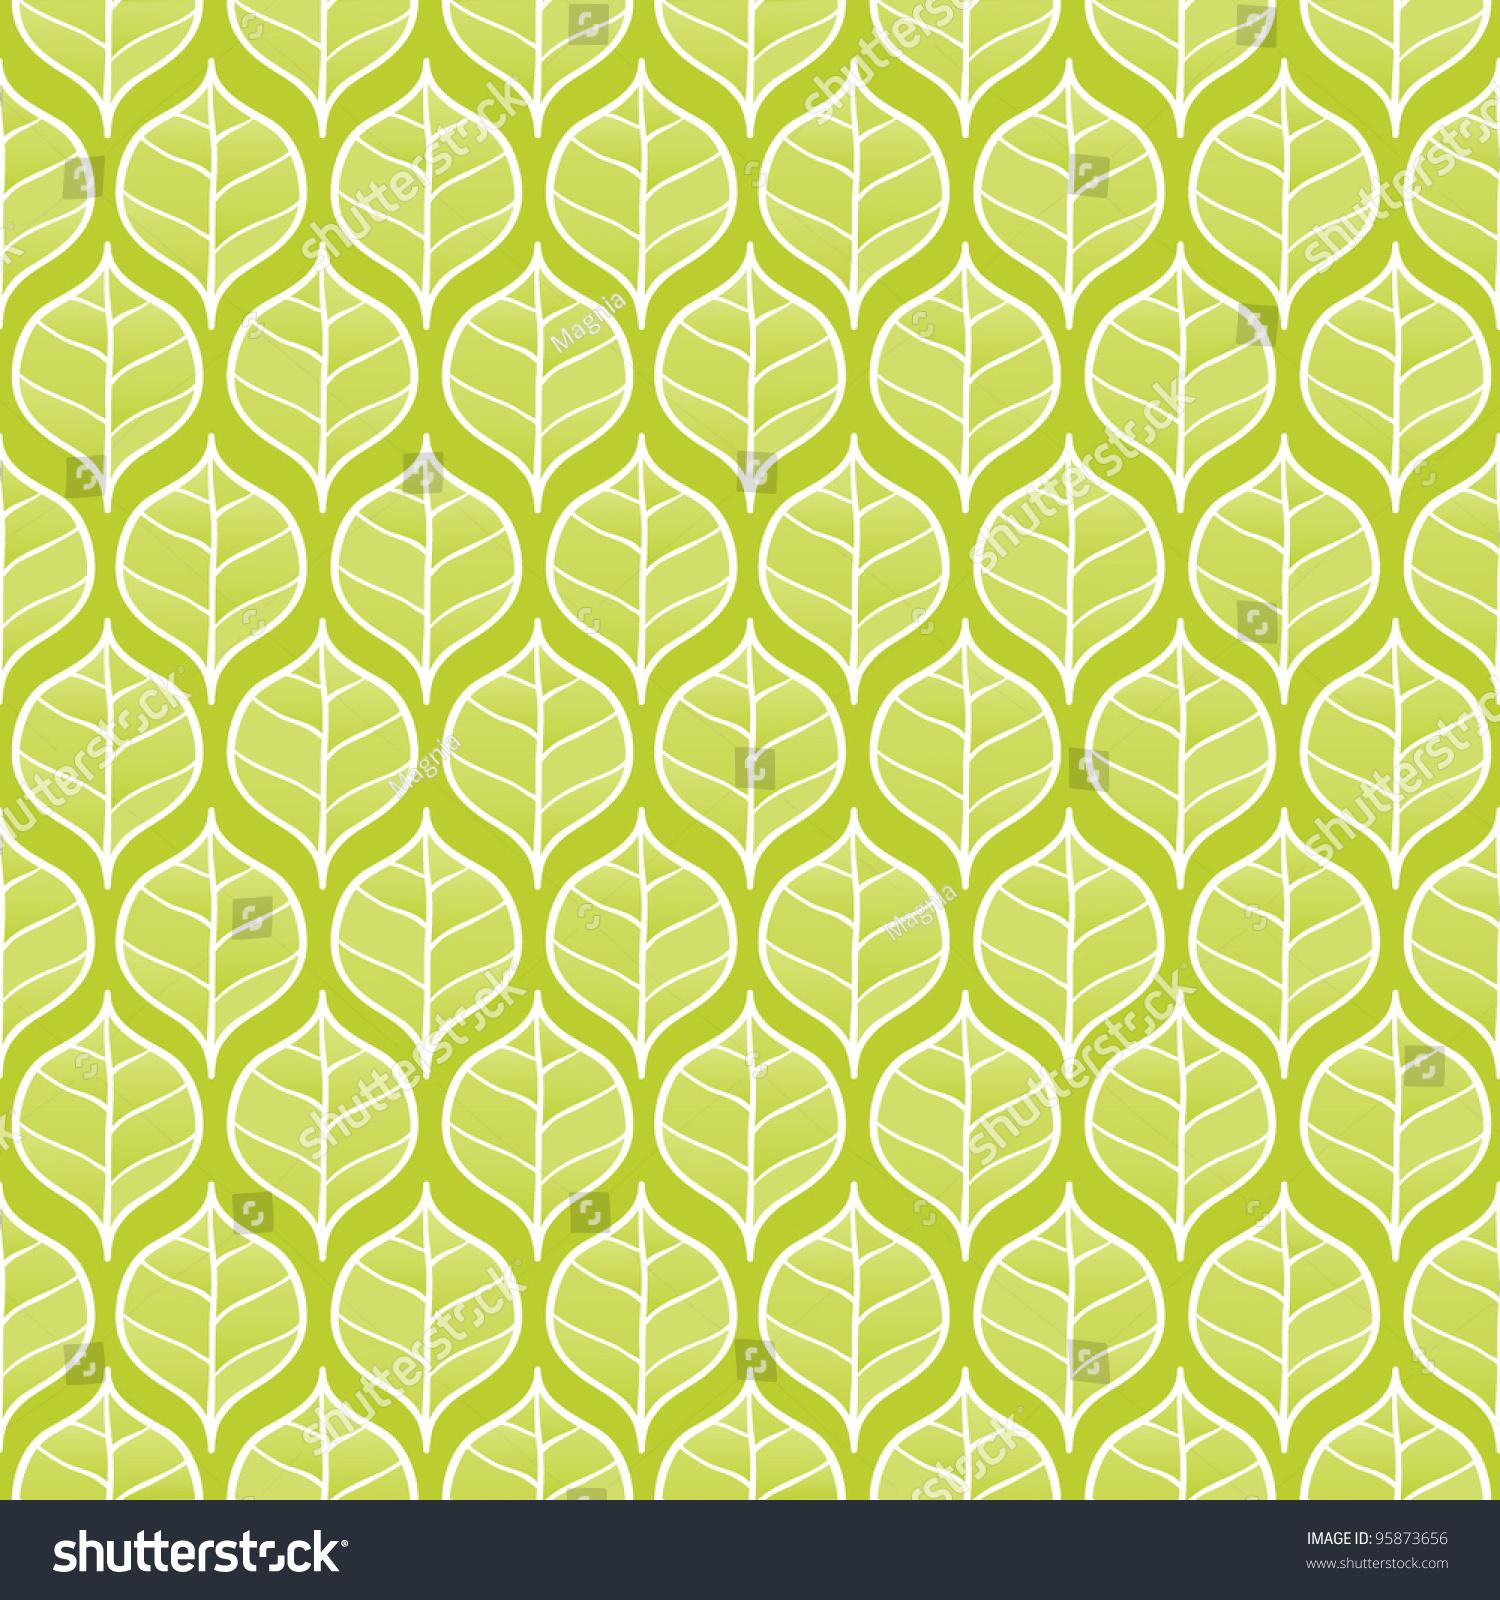 Pattern Images Stock Photos amp Vectors  Shutterstock